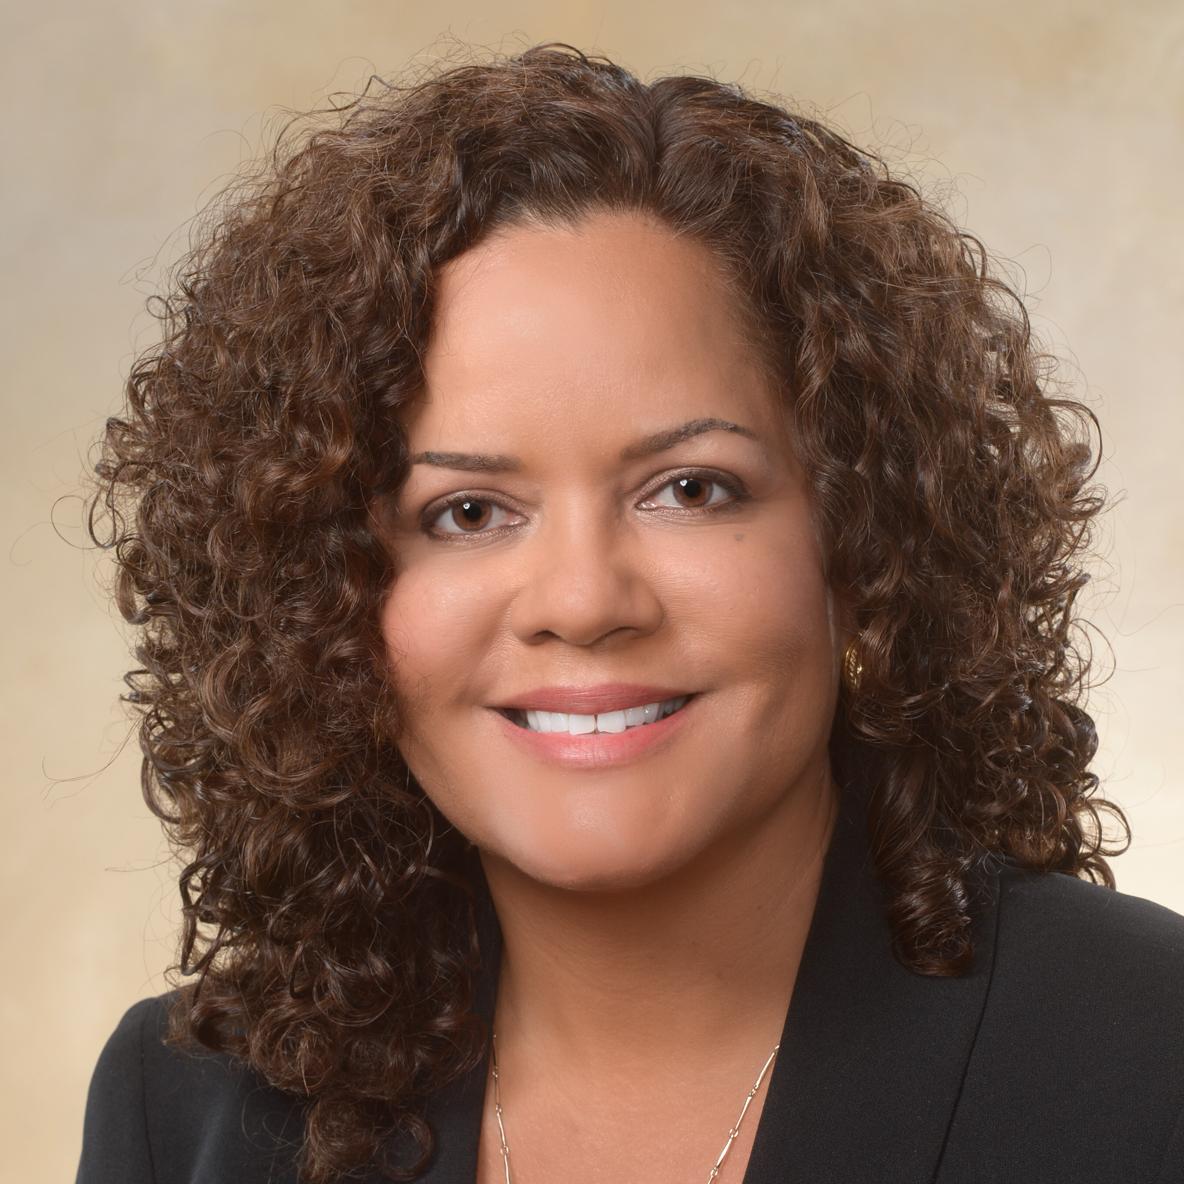 Headshot of Jadira Hoptry Flagship Enterprise Capital Board of Directors Member